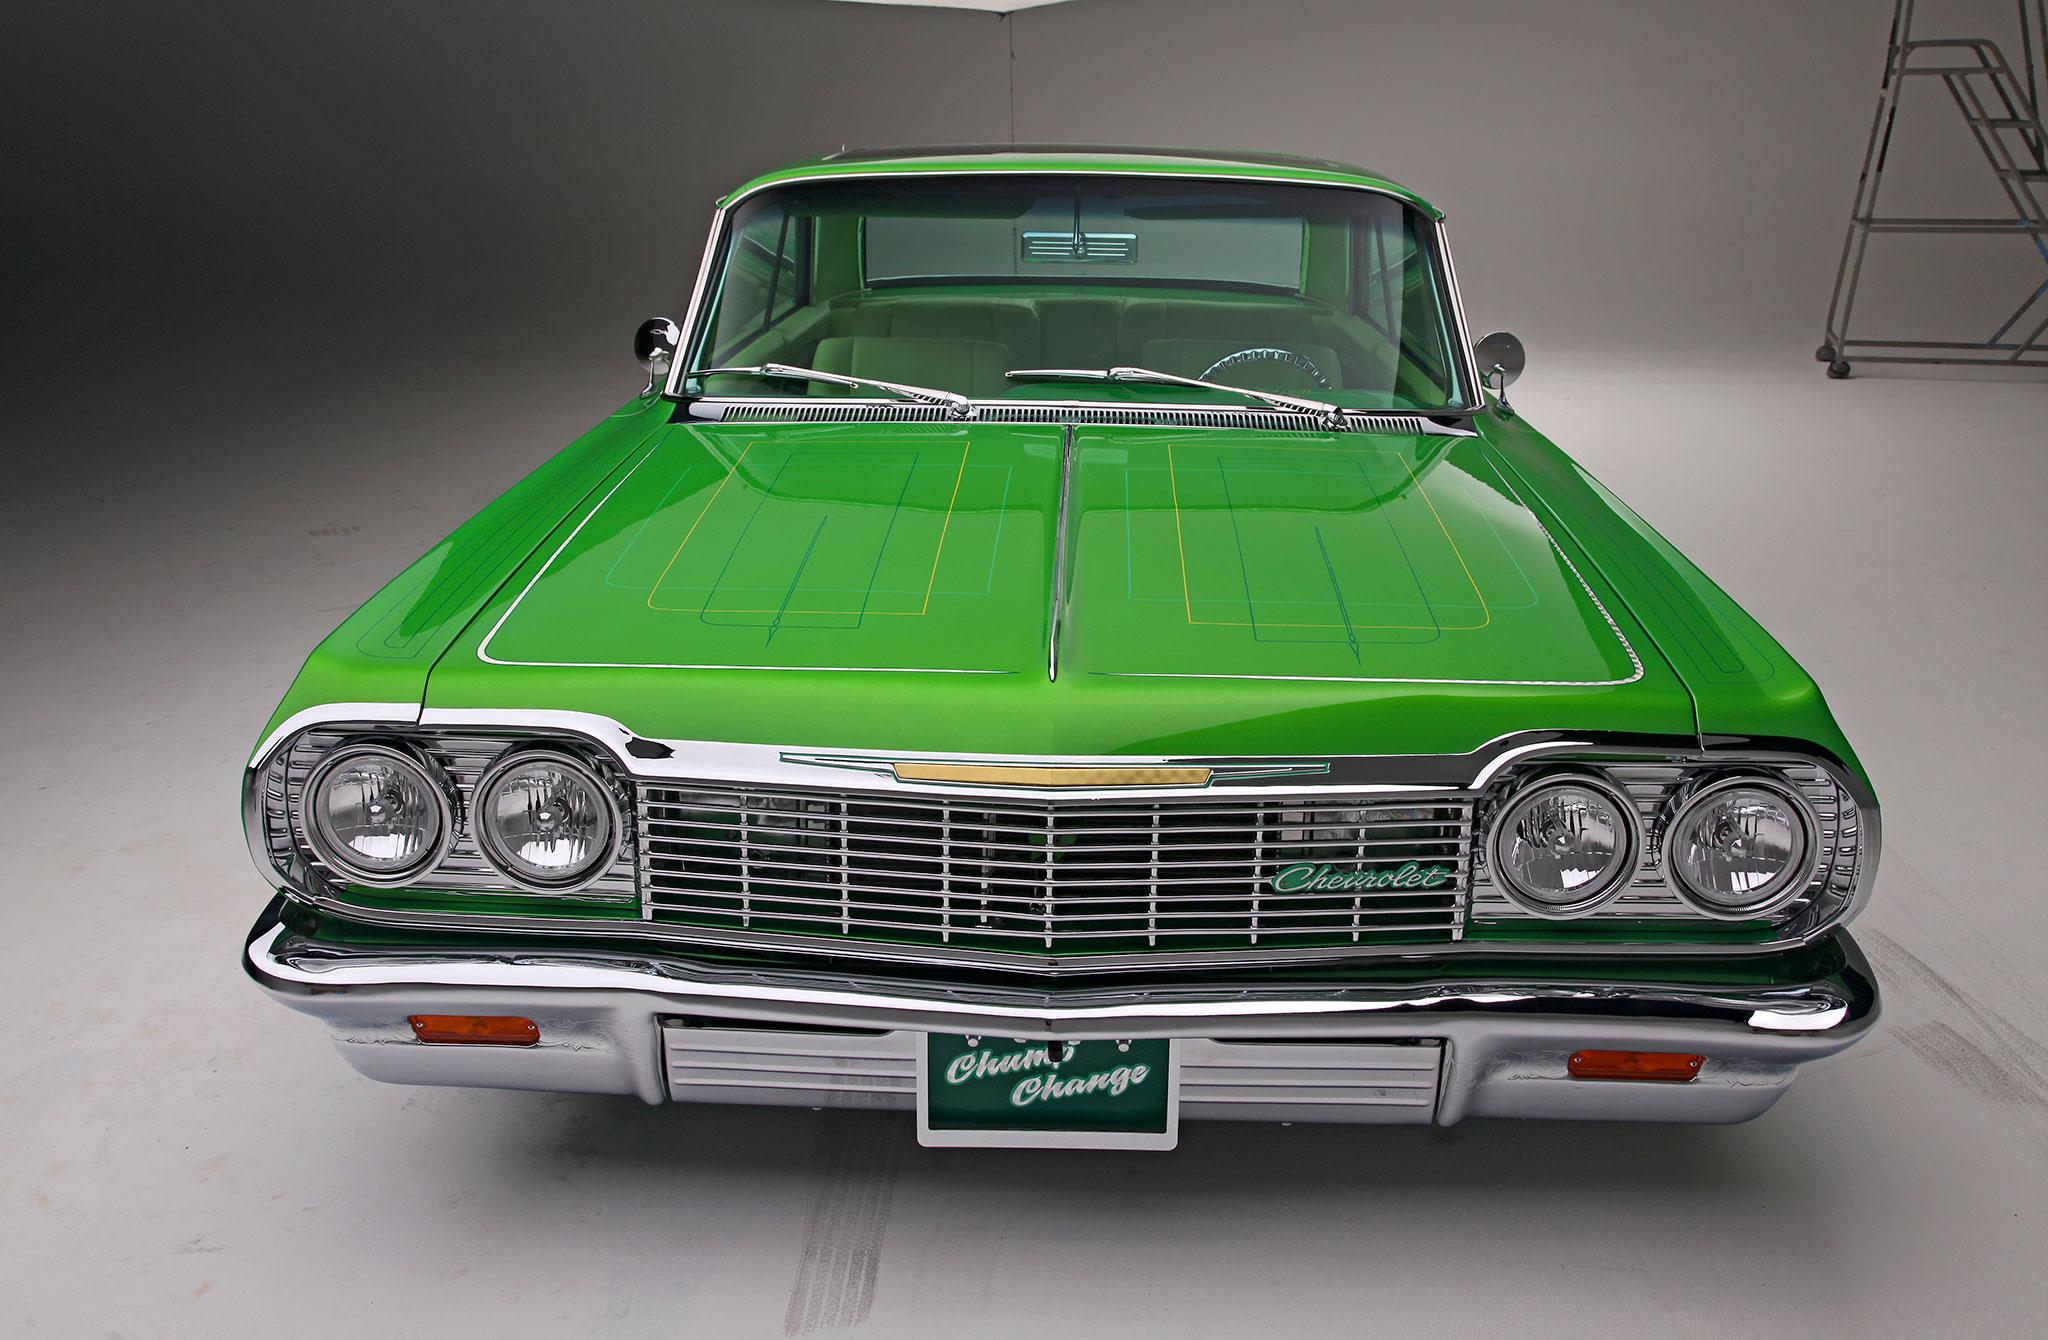 1964 Chevrolet Impala - Lime Green Machine